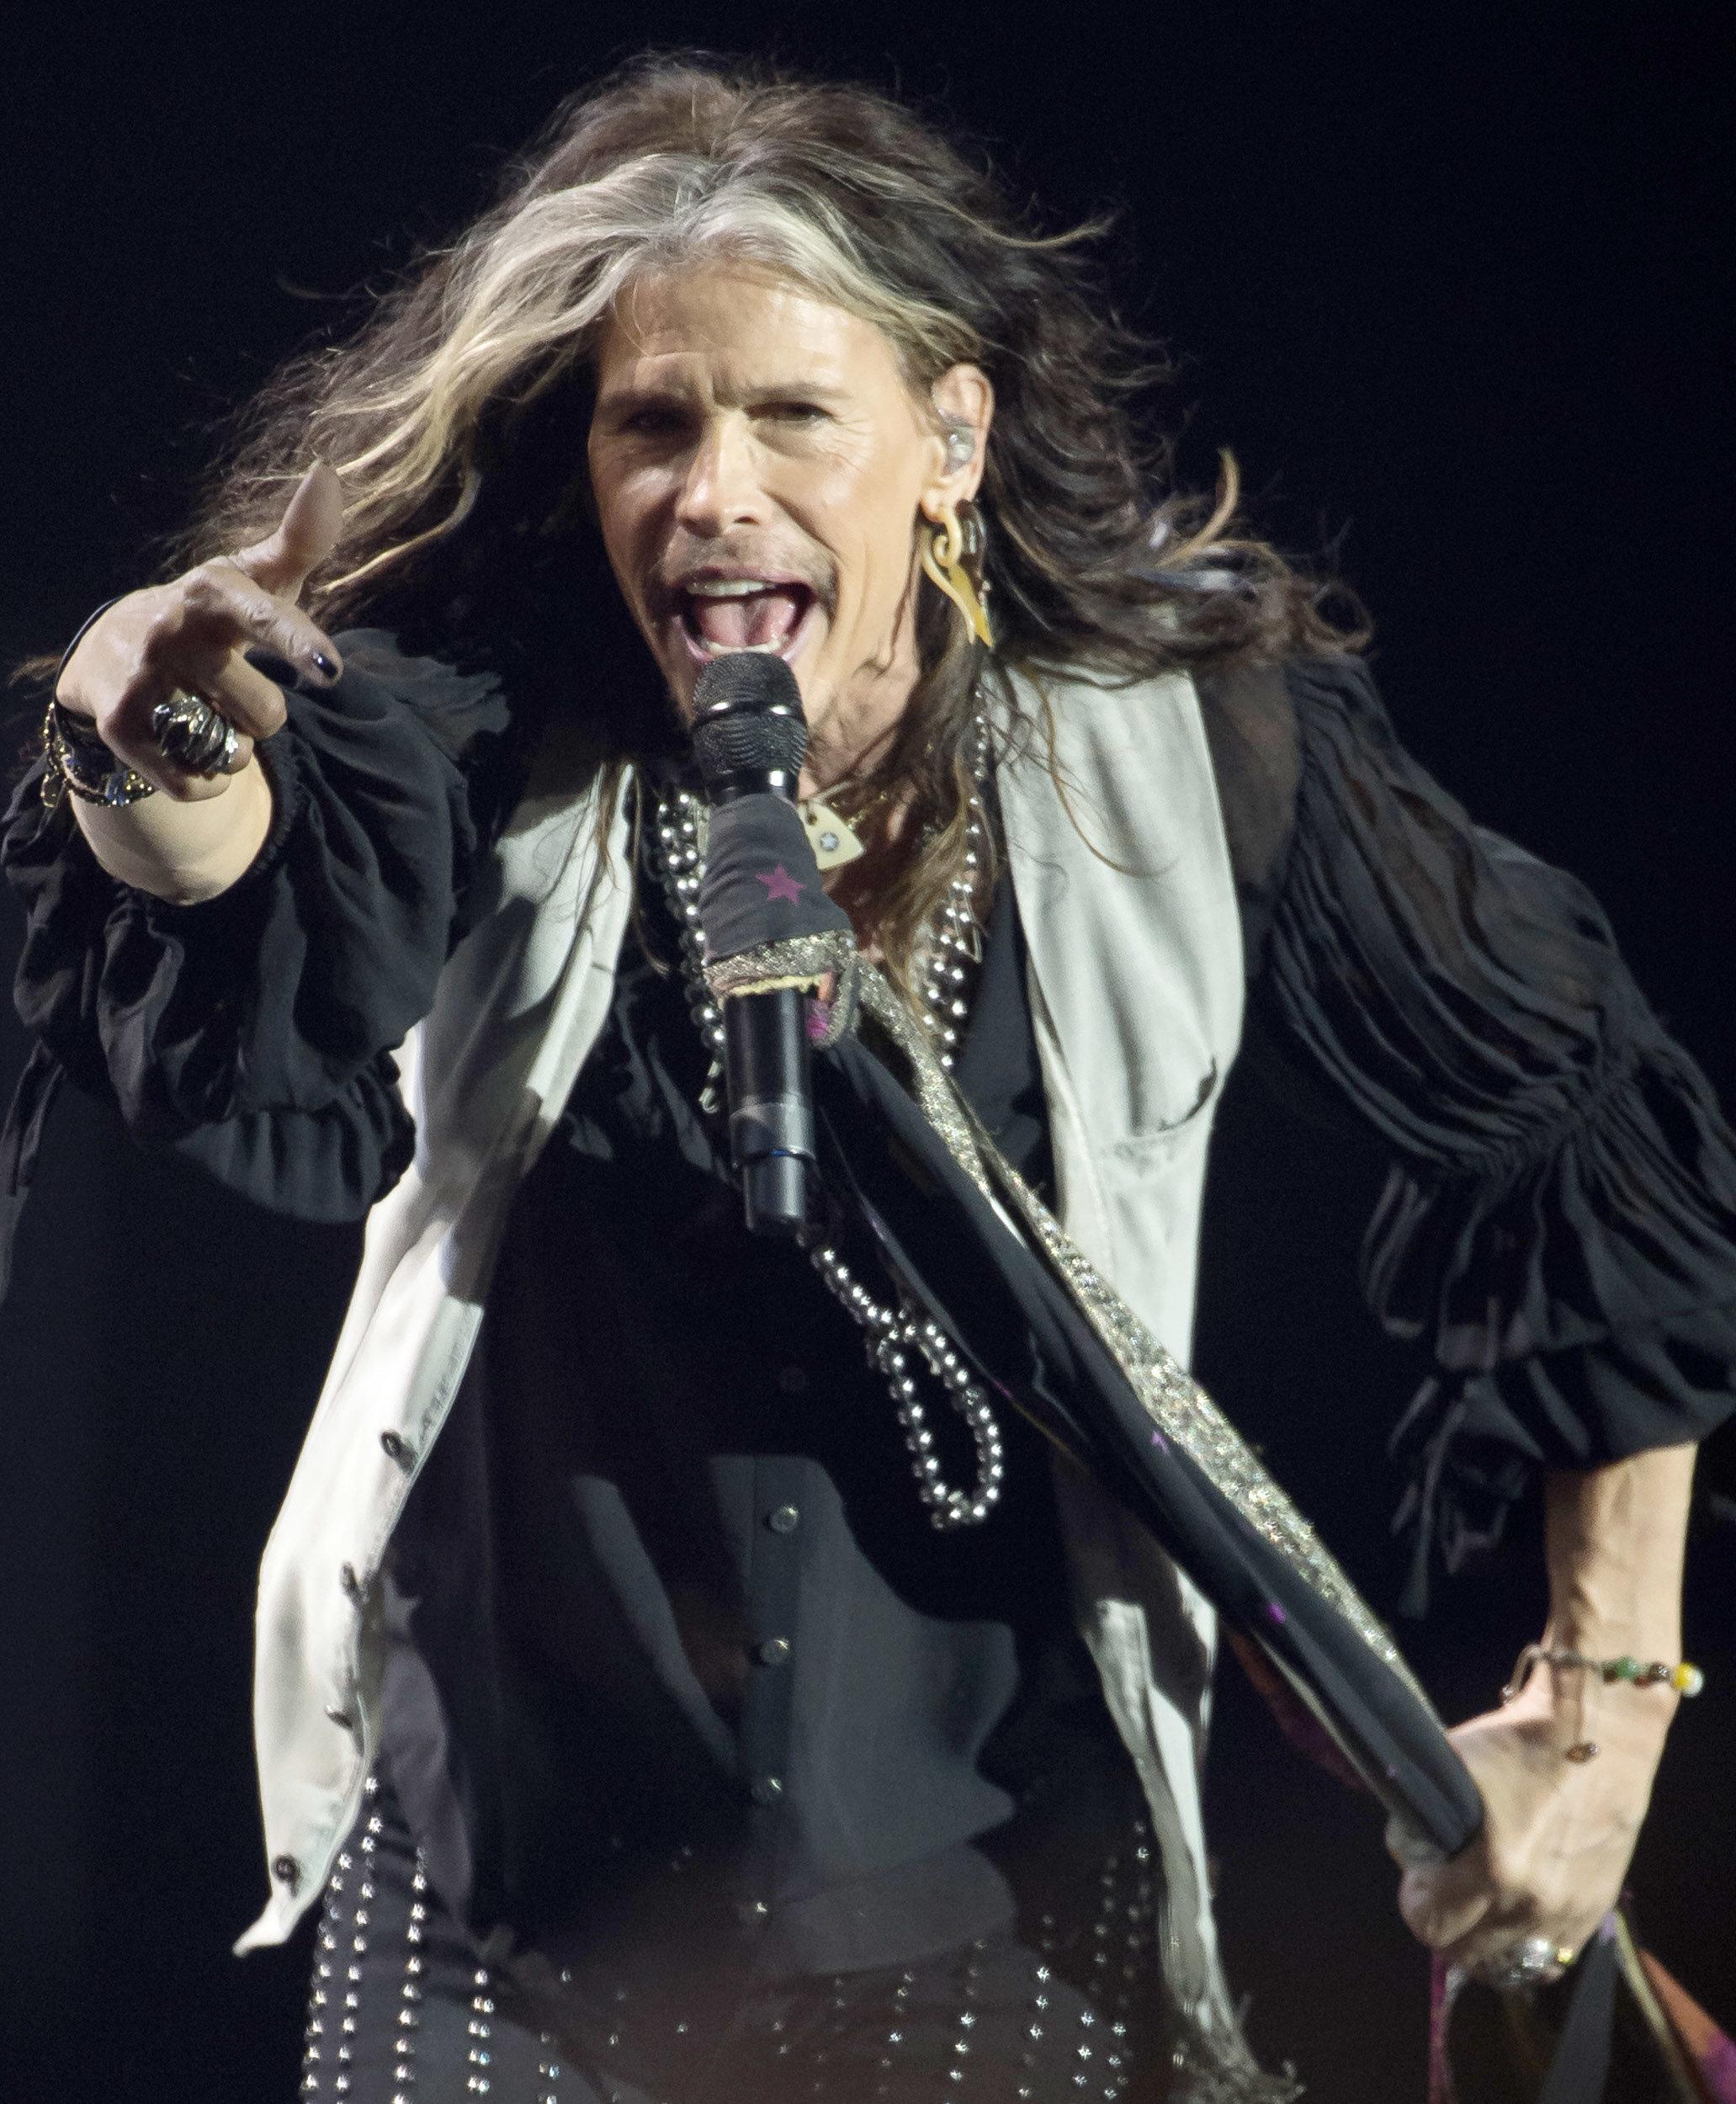 Aerosmith cancels tour dates due to Steven Tyler's health